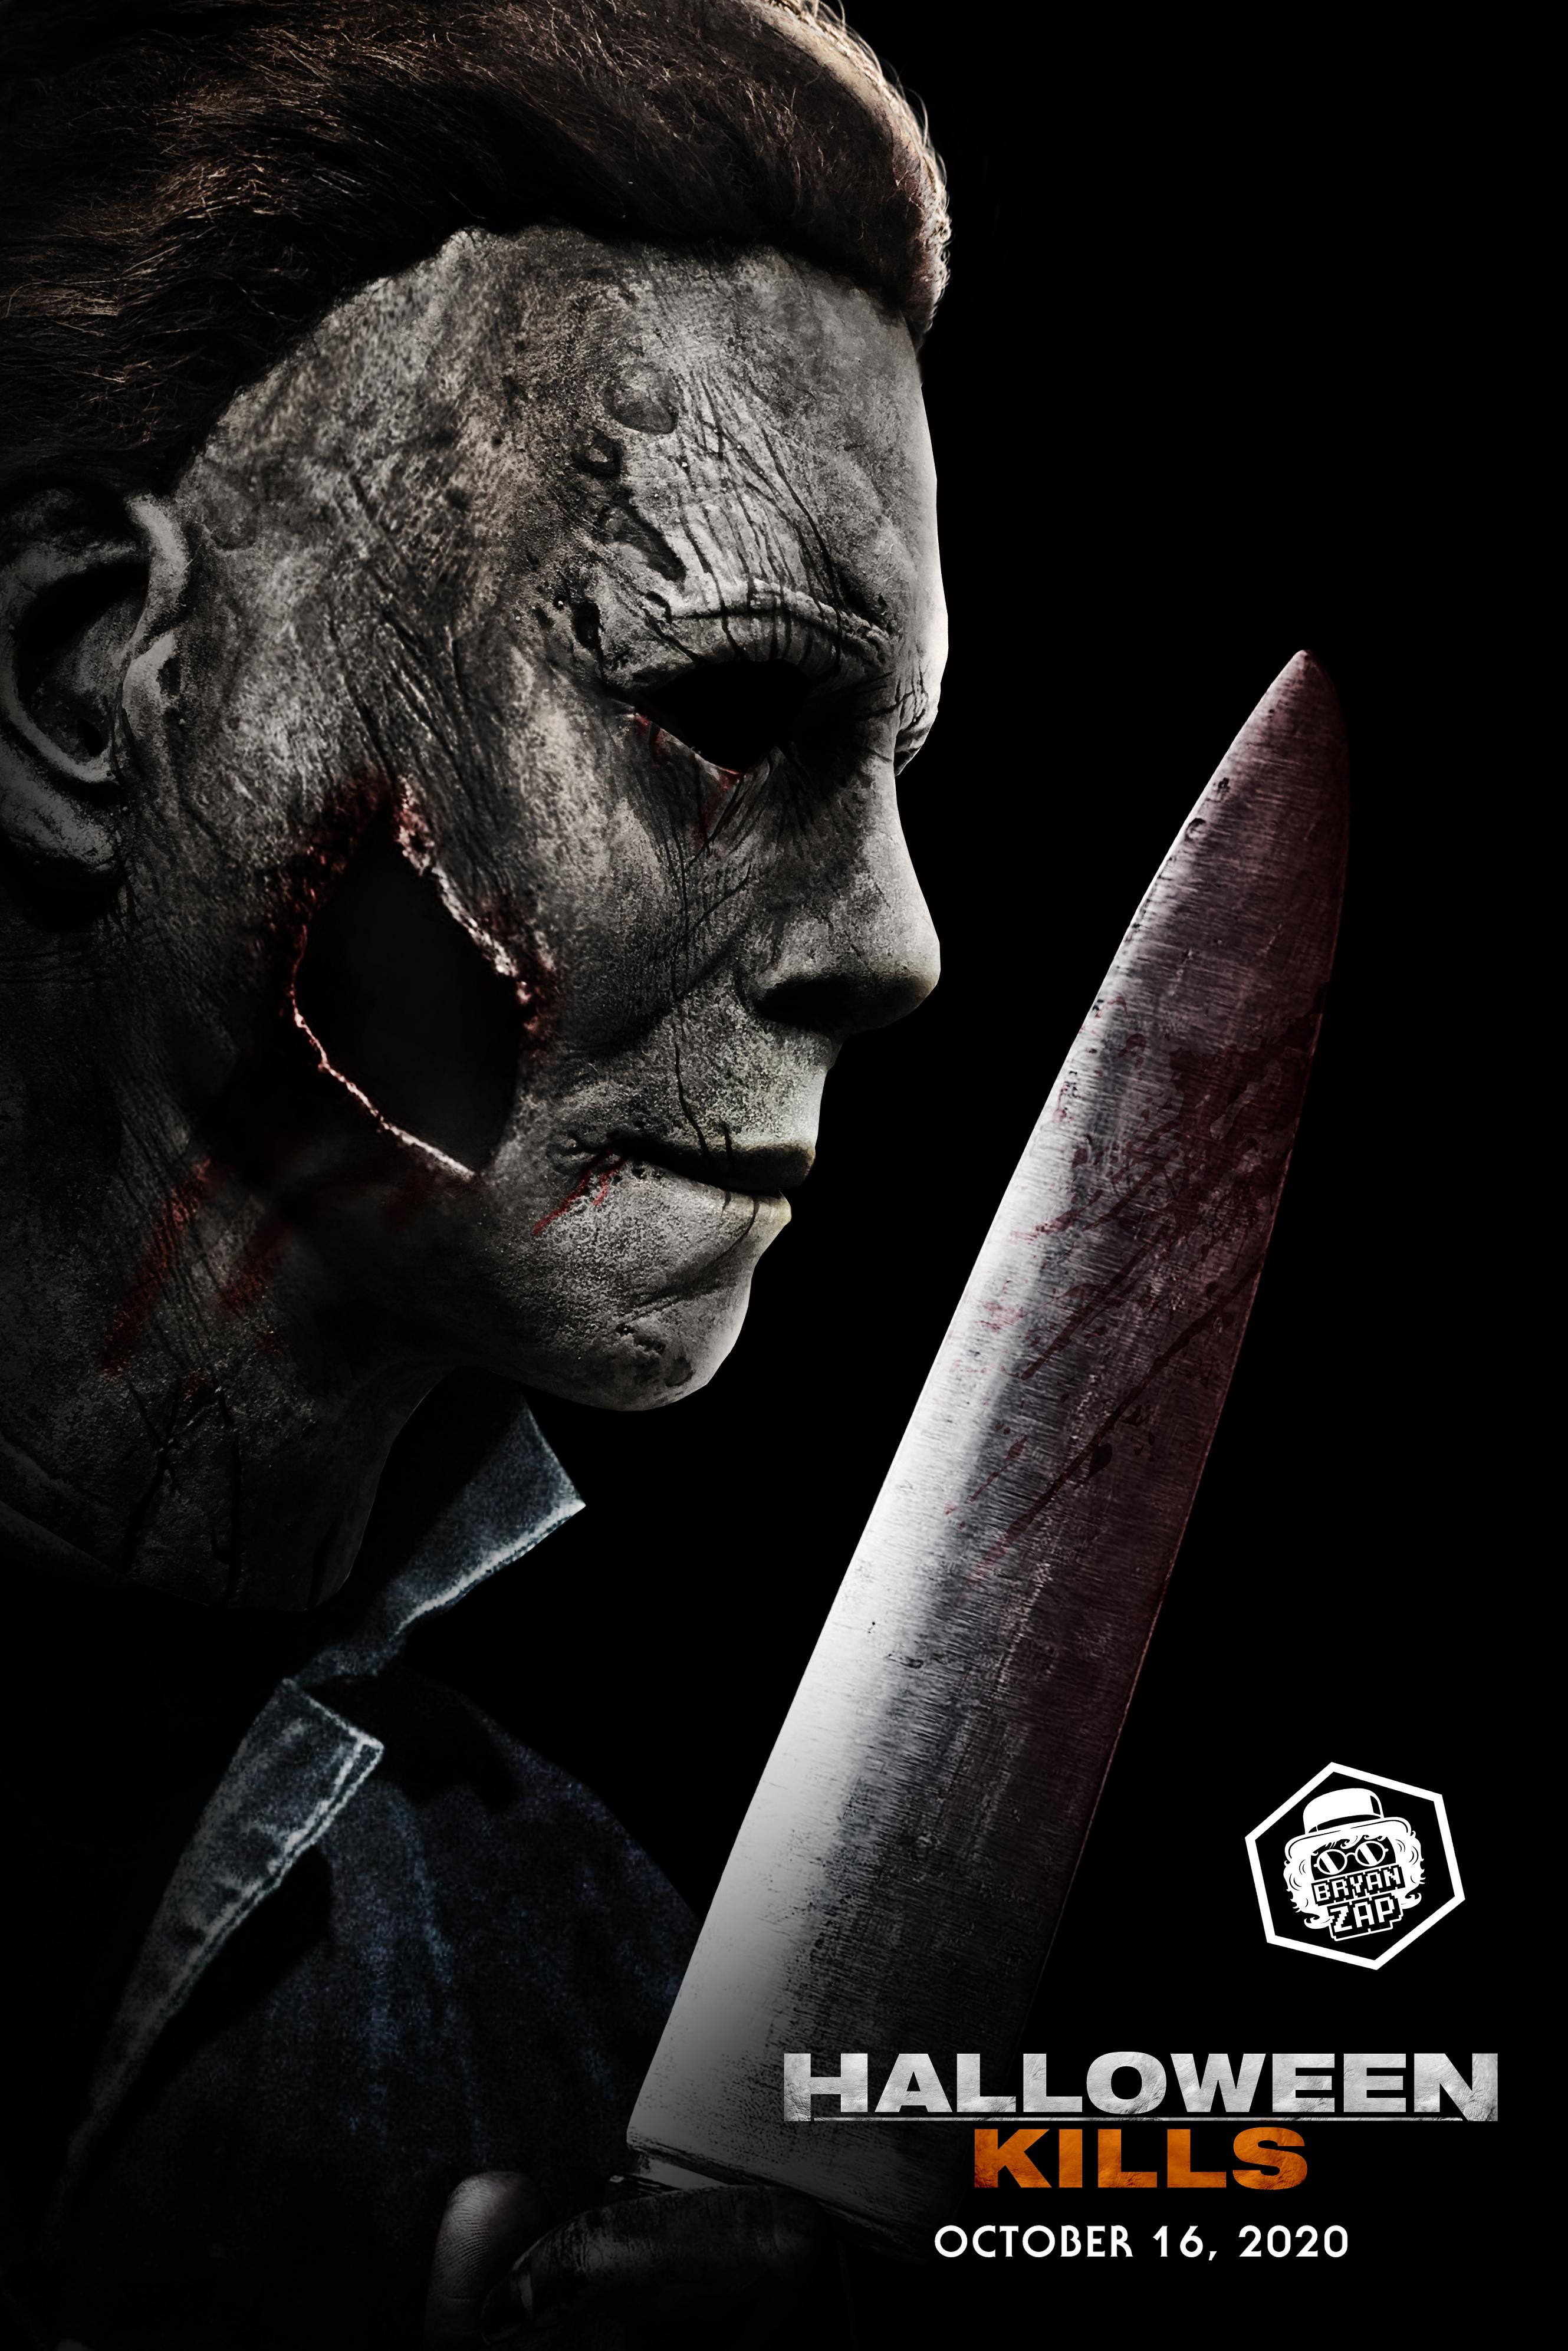 Halloween Michael Myers 2020 Poster Halloween Kills Poster by Bryanzap on DeviantArt